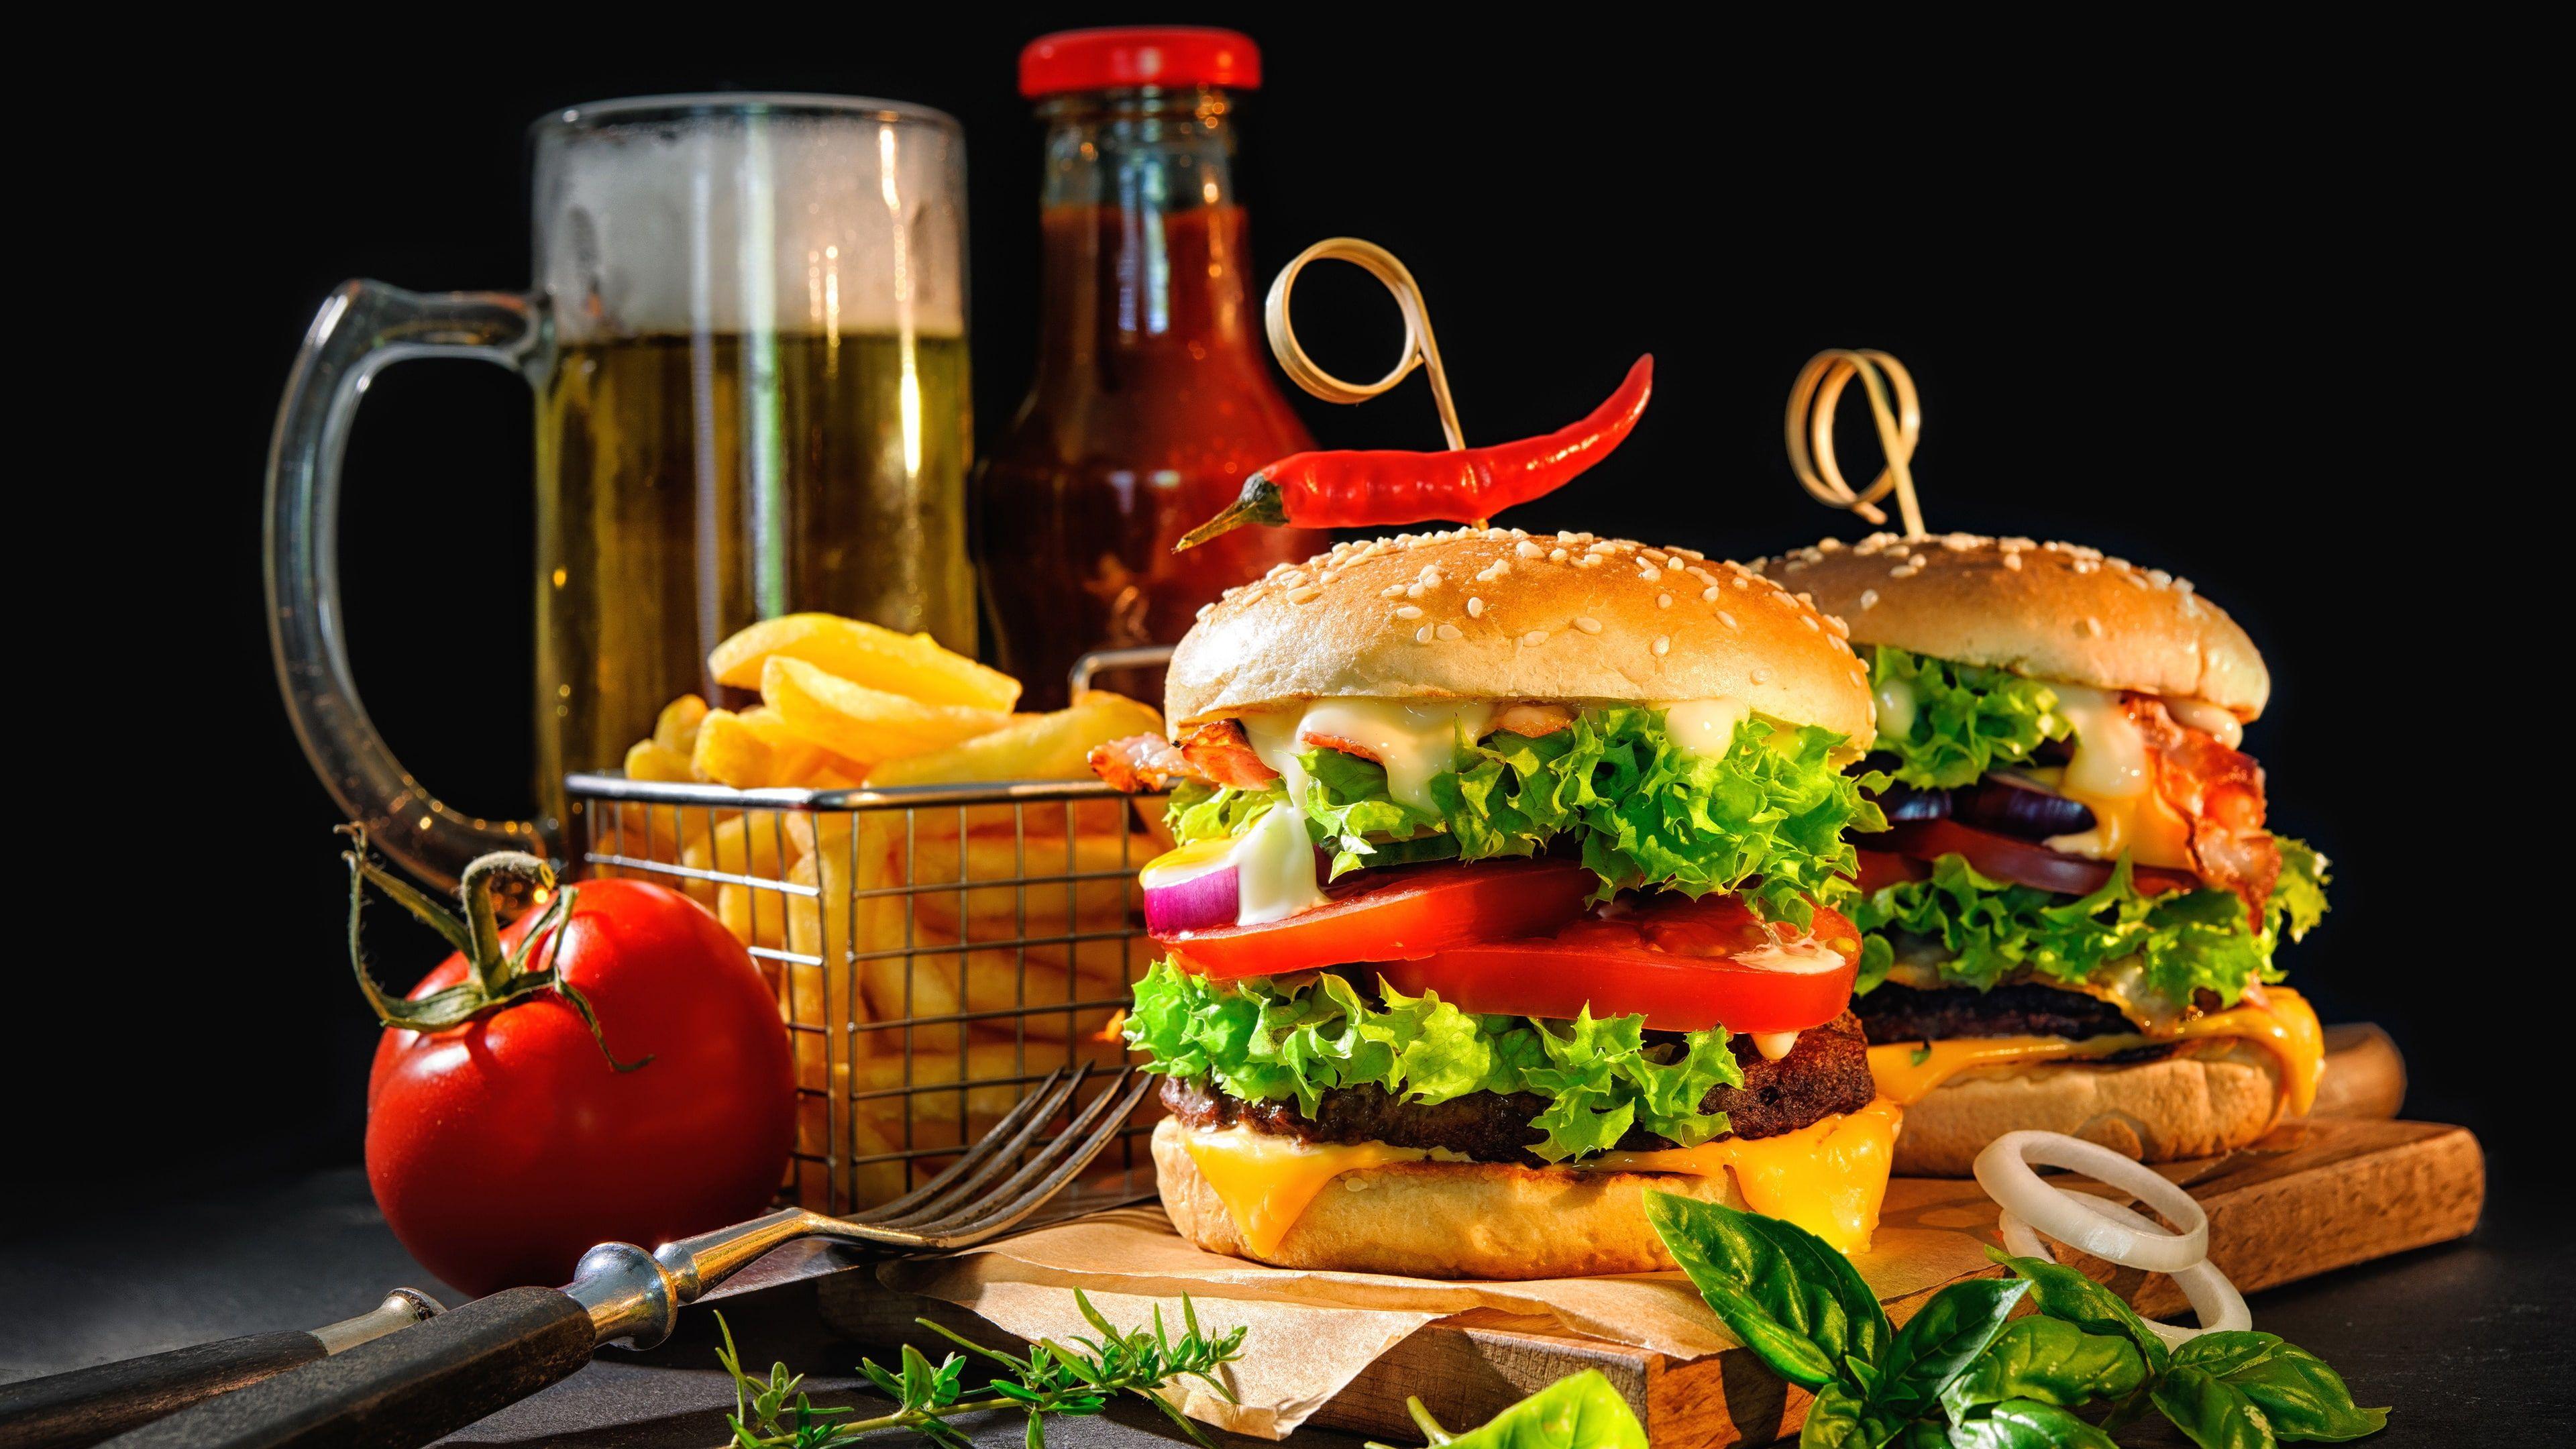 Fast Food Junk Food Food Hamburger Sandwich Beer Finger Food French Fries Cheeseburger American Food 4k Wallpaper Hdwal Food Food Wallpaper Eating Fast Food full hd wallpaper